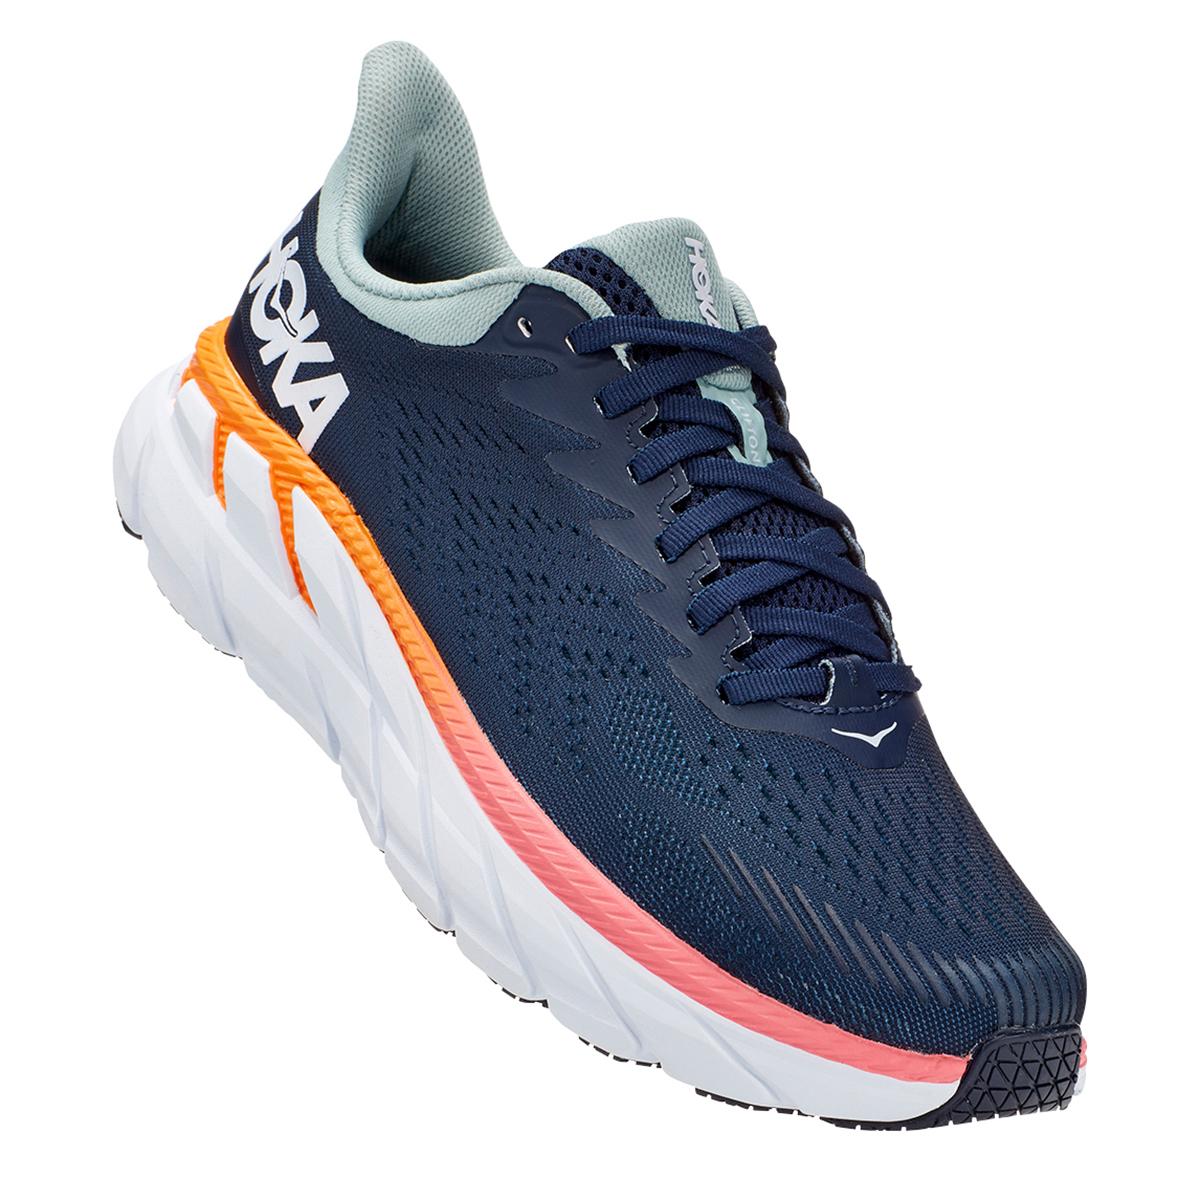 Women's Hoka One One Clifton 7 Running Shoe - Color: Black Iris/Blue Haze - Size: 6 - Width: Regular, Black Iris/Blue Haze, large, image 4